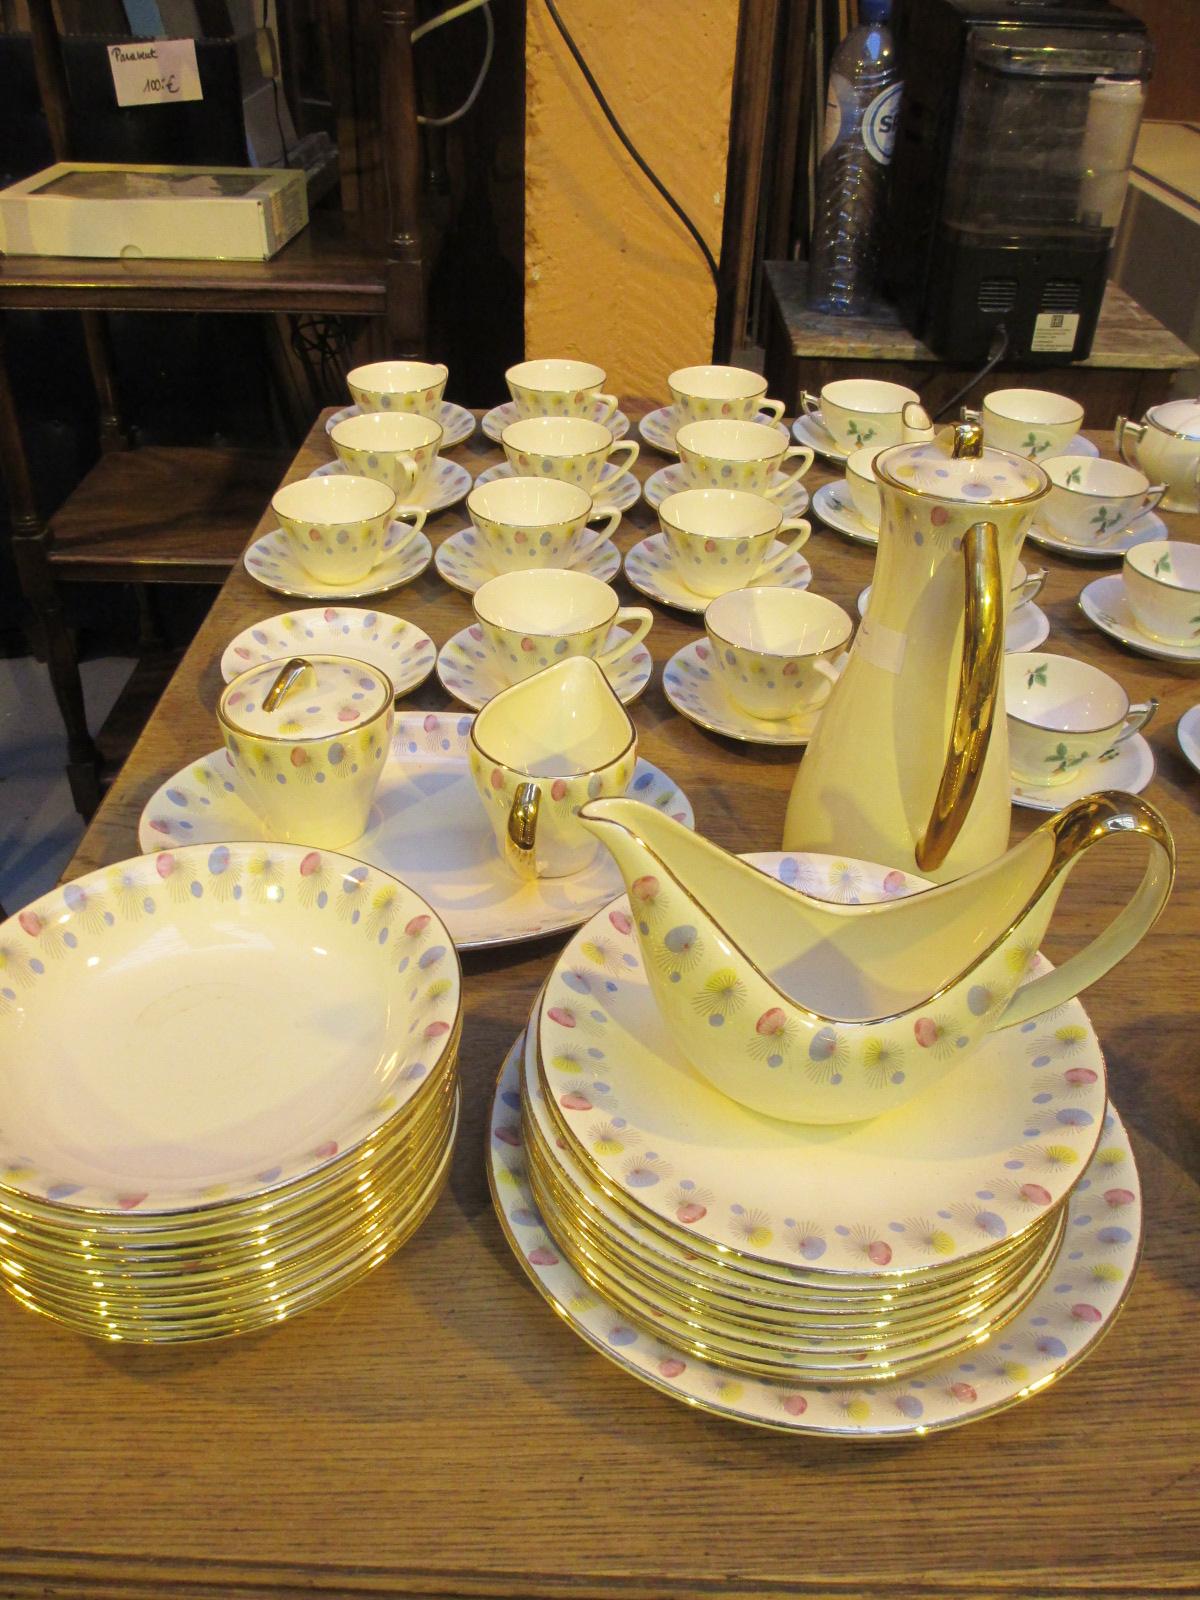 Service porcelaine Boch Image